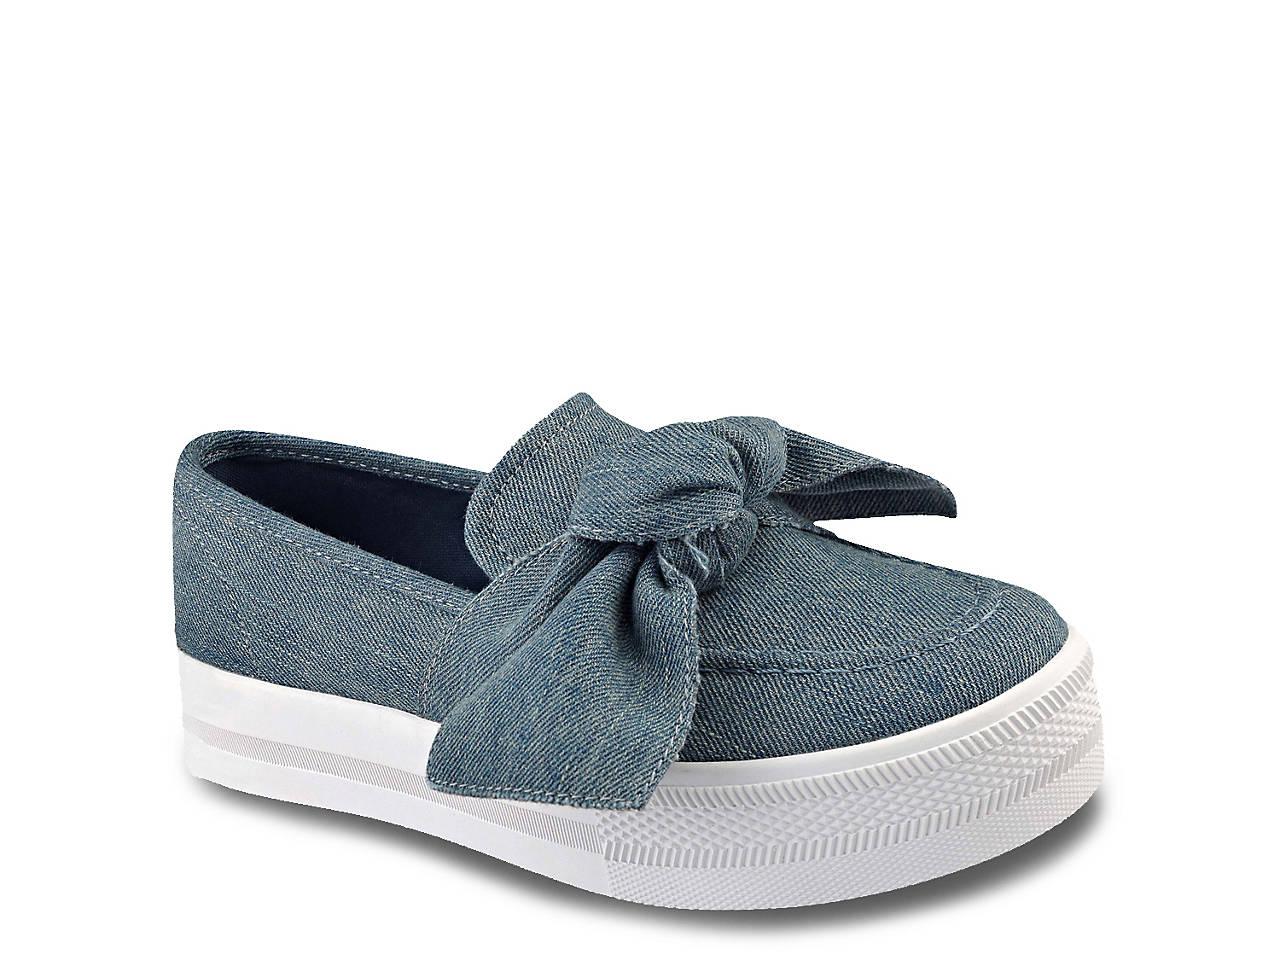 e84d6c6a20e9 G by GUESS Chippy Platform Slip-On Women s Shoes